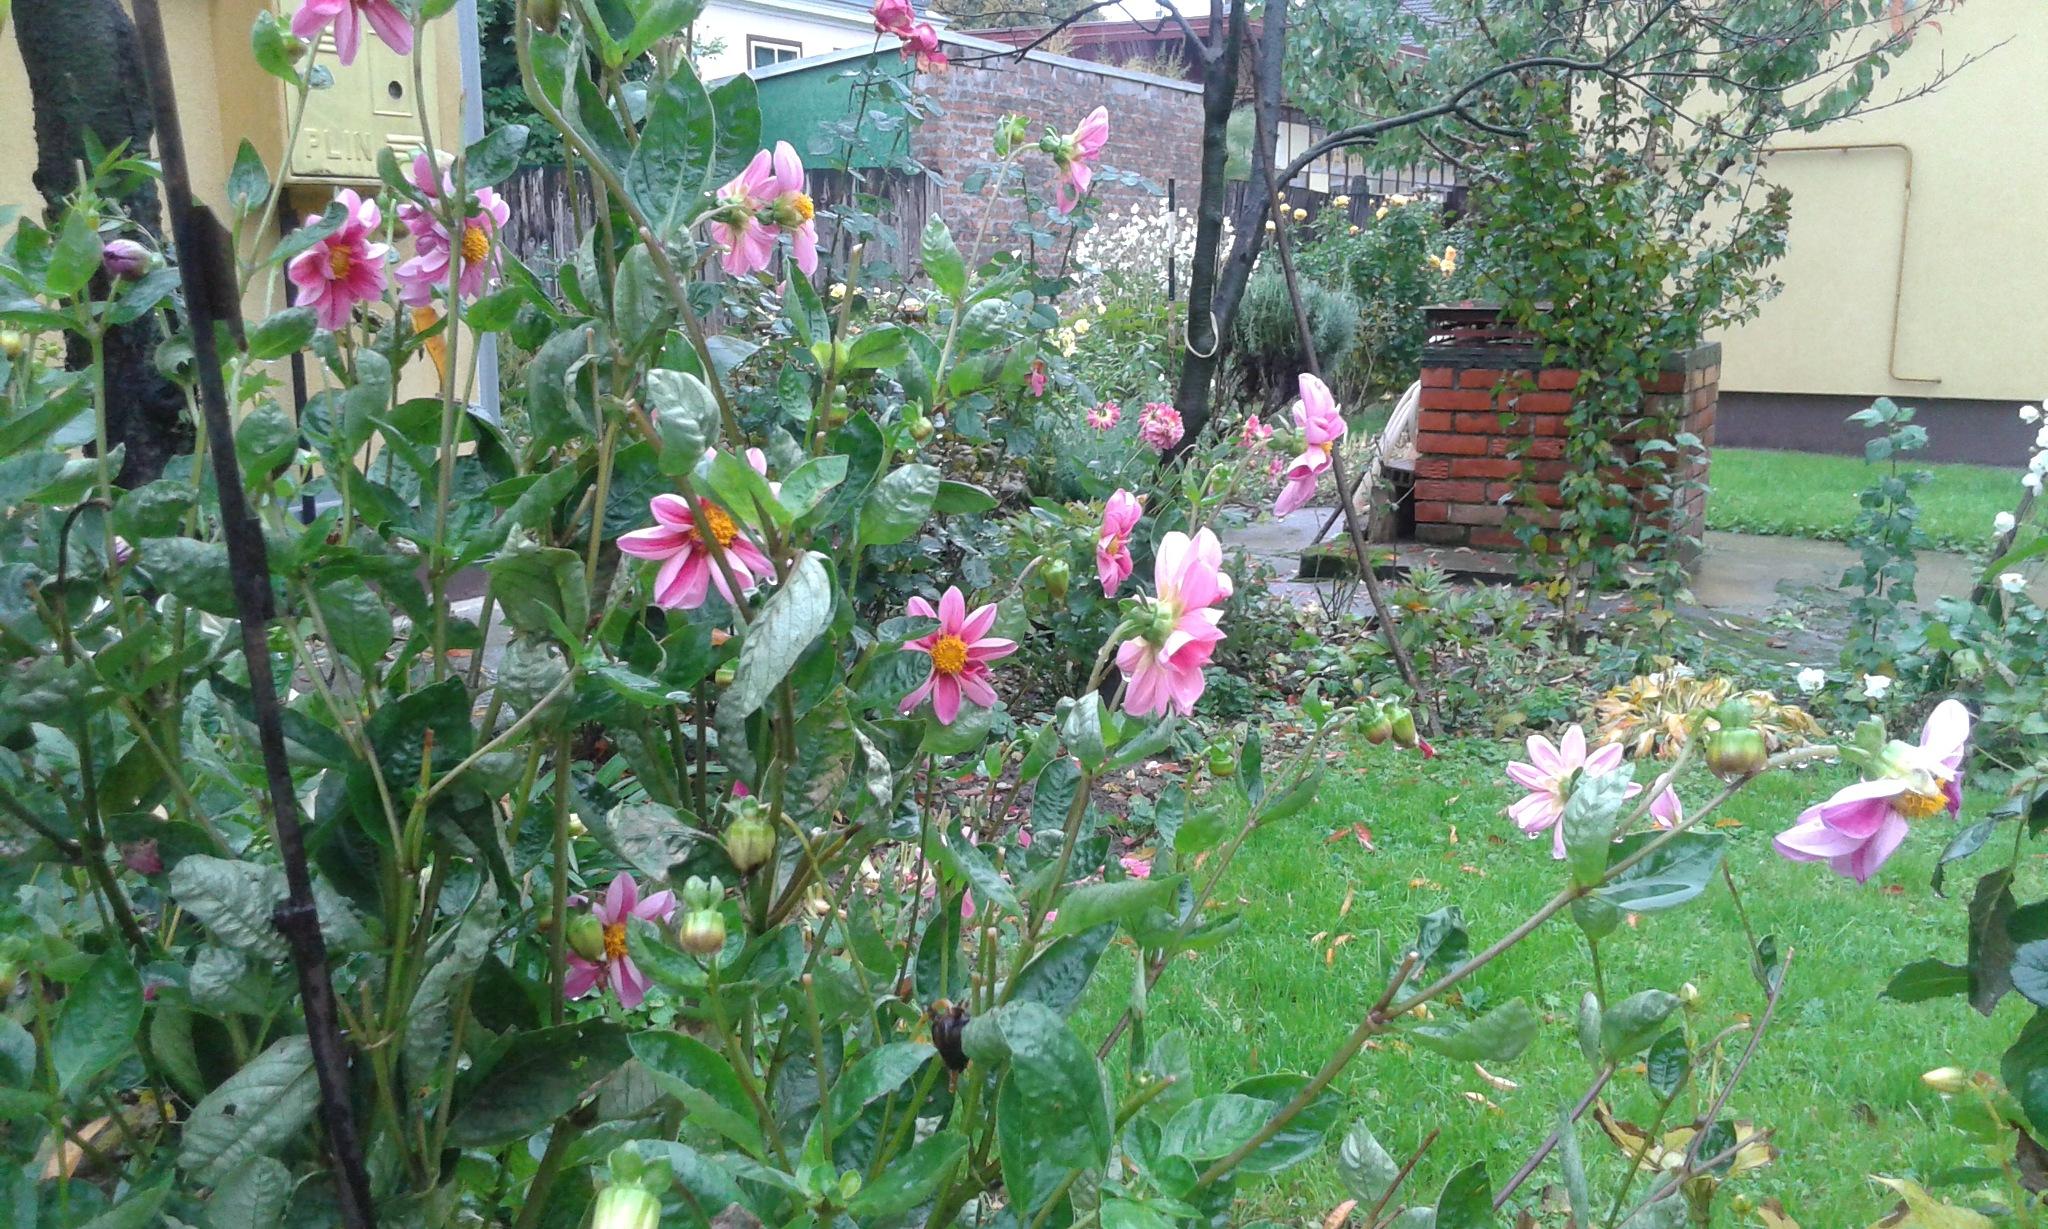 Šarenilo cvijeća by Mary13